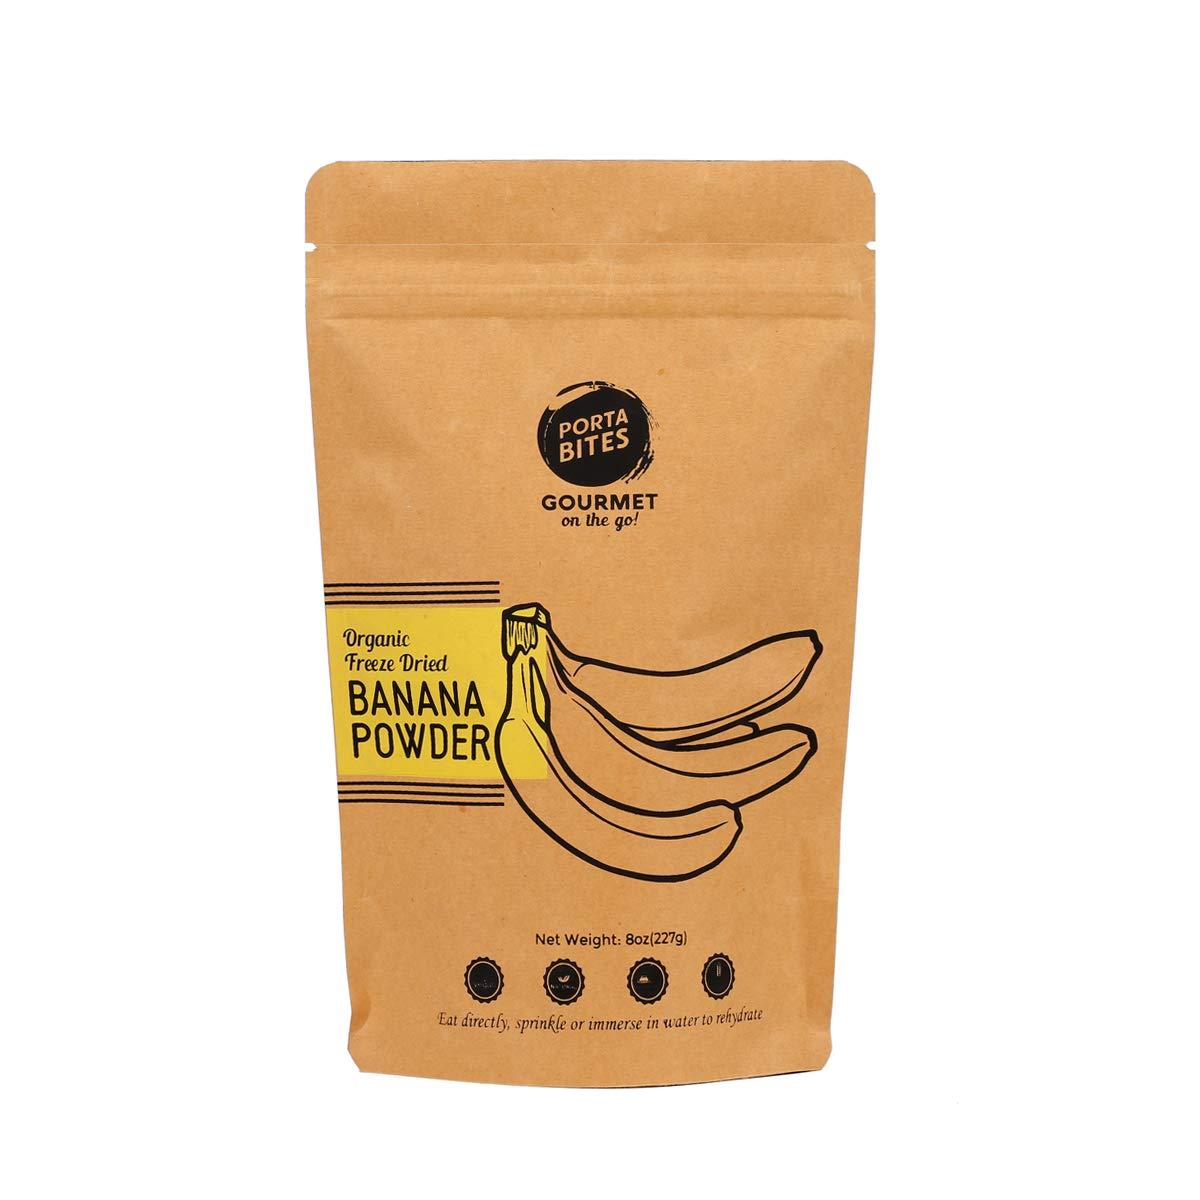 PORTA BITES Organic Freeze-Dried Banana Powder, All Natural, Gluten-Free, Vegan Source of Fiber & Vitamins, Survival Food (8oz)